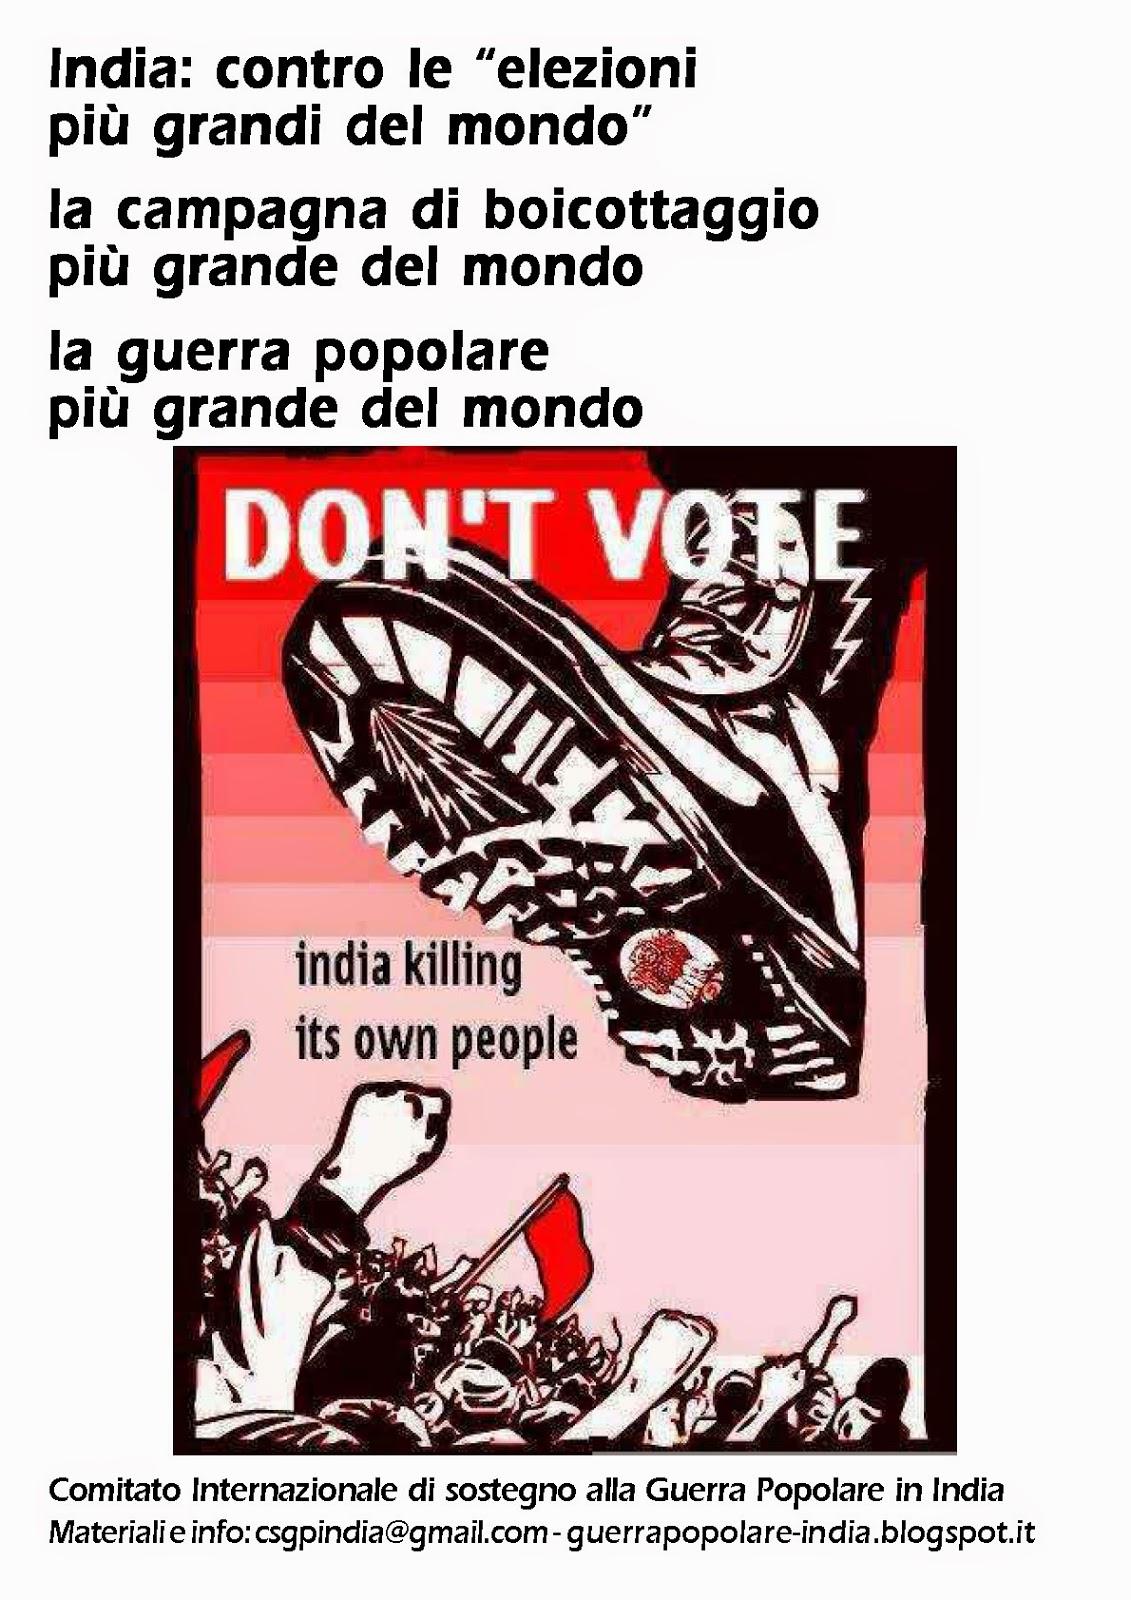 http://icspwindia.files.wordpress.com/2014/04/boycott20141.pdf